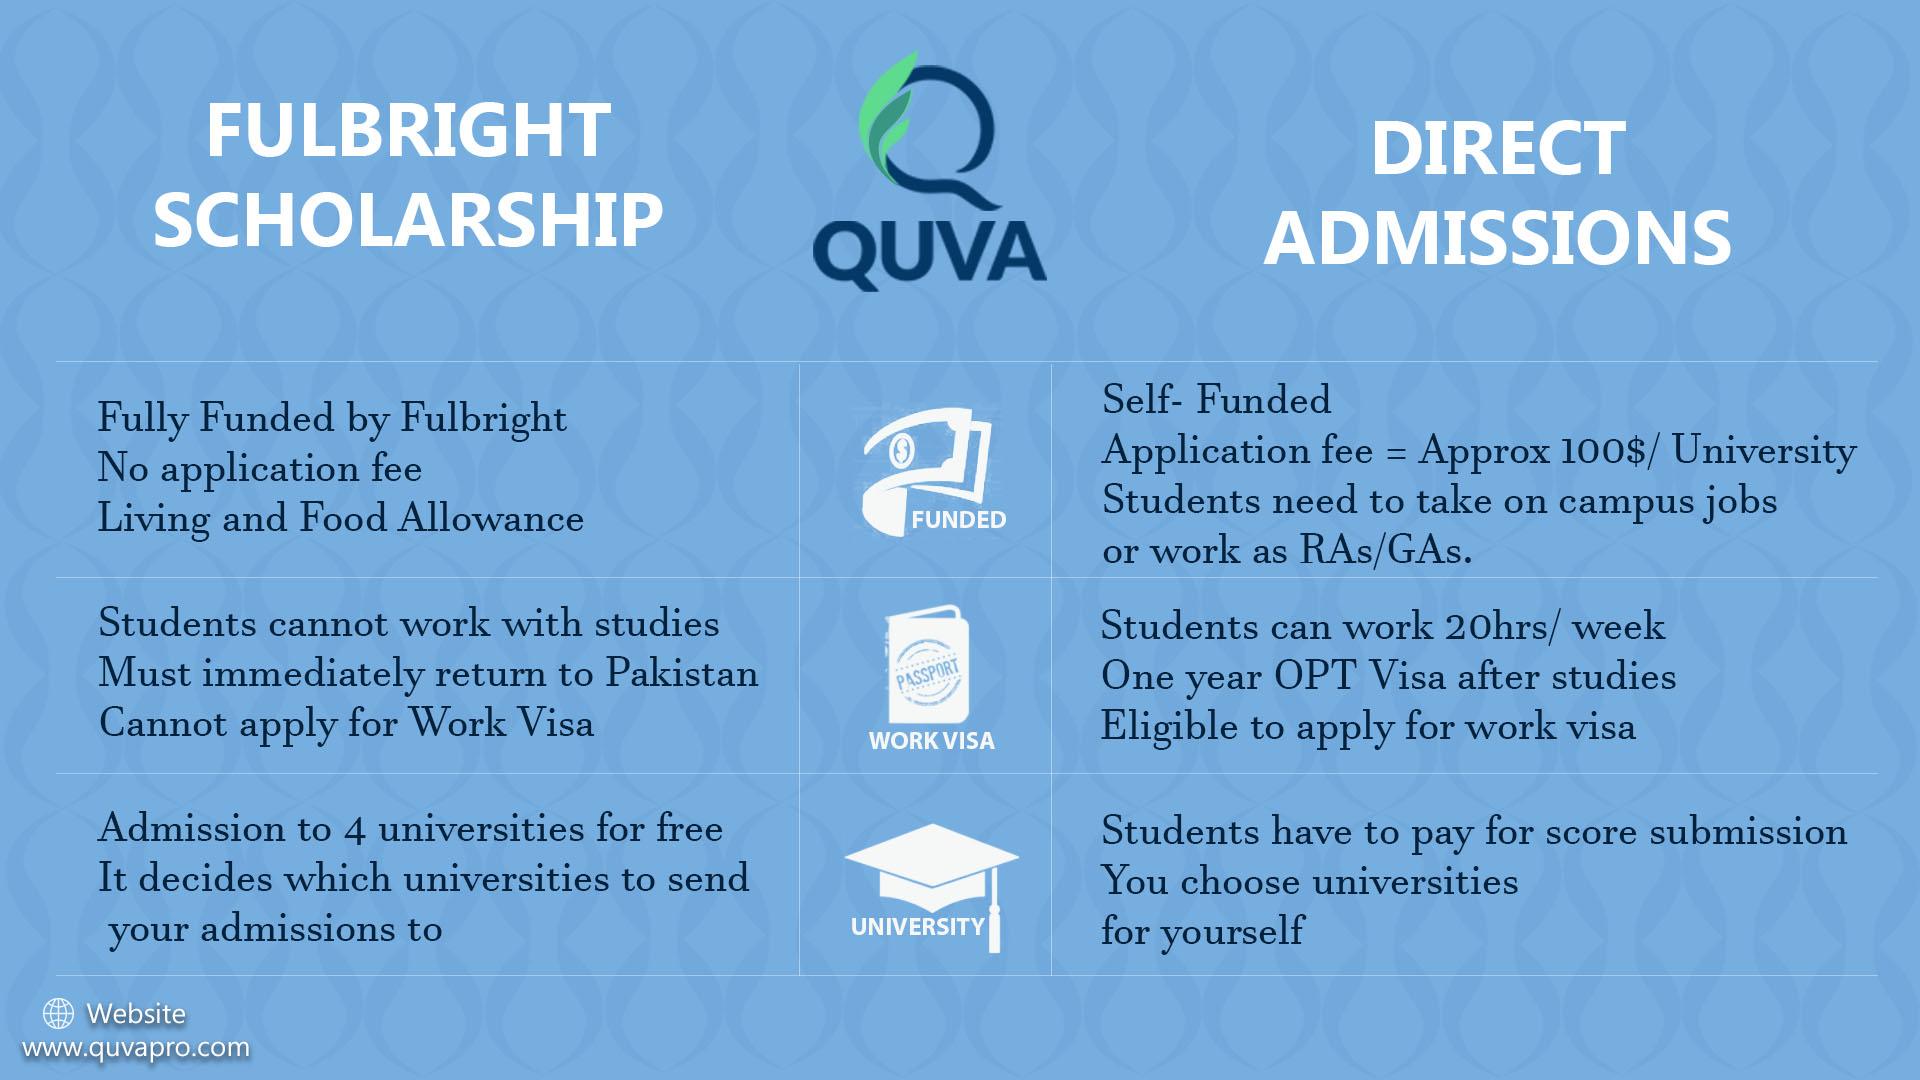 Fulbright-Scholarship-vs-Direct-Admission